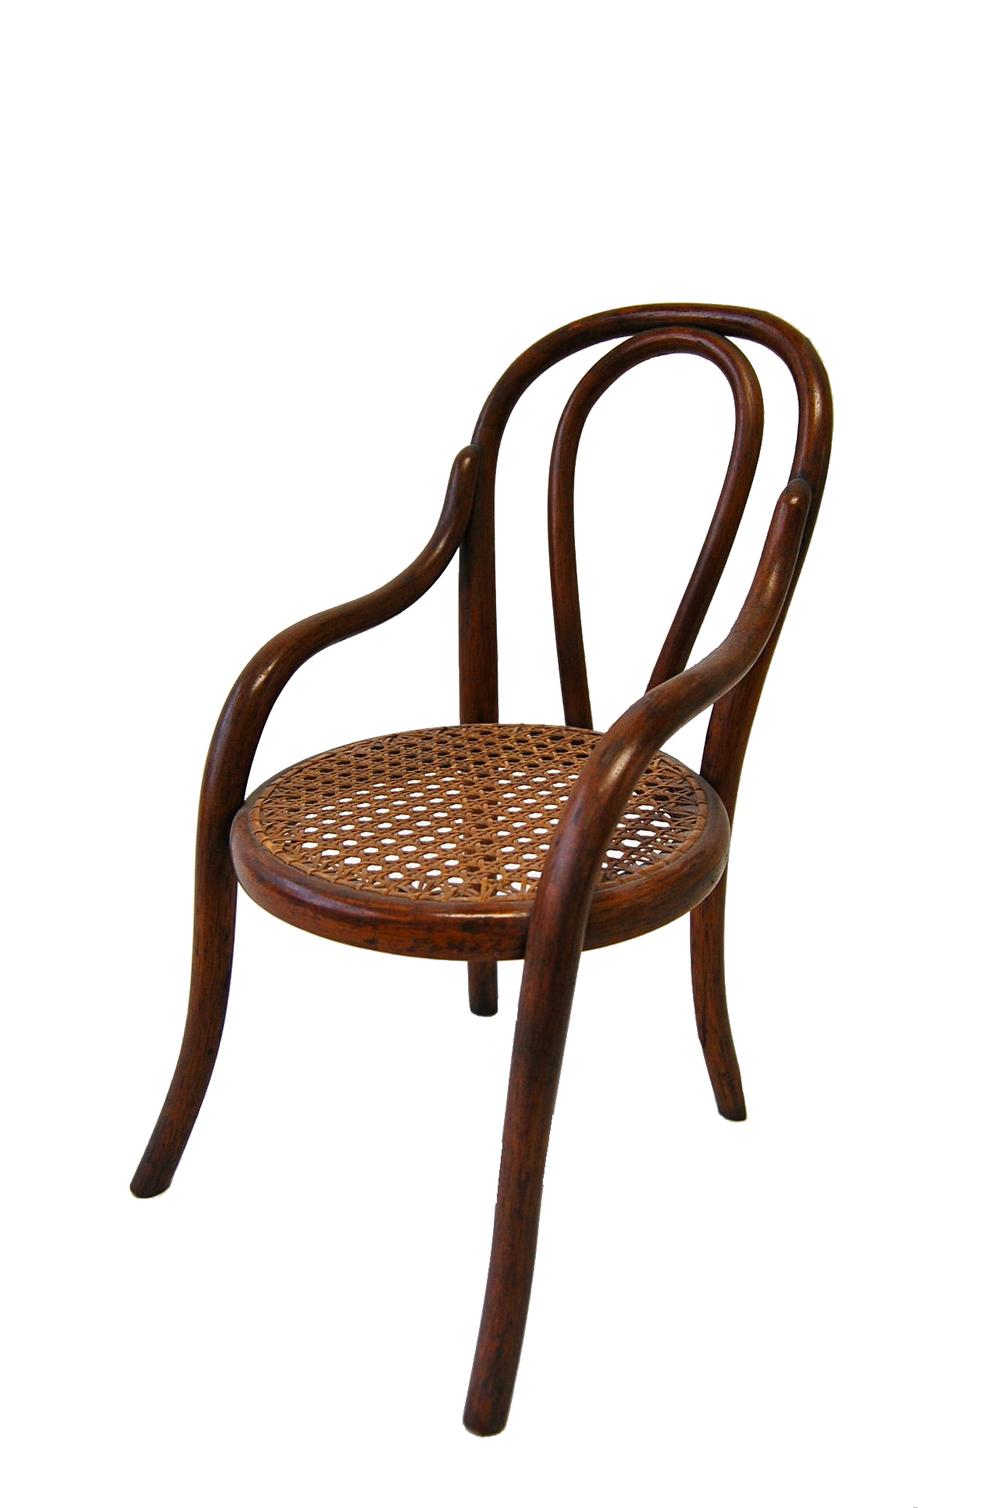 dool's side chair 7.jpg